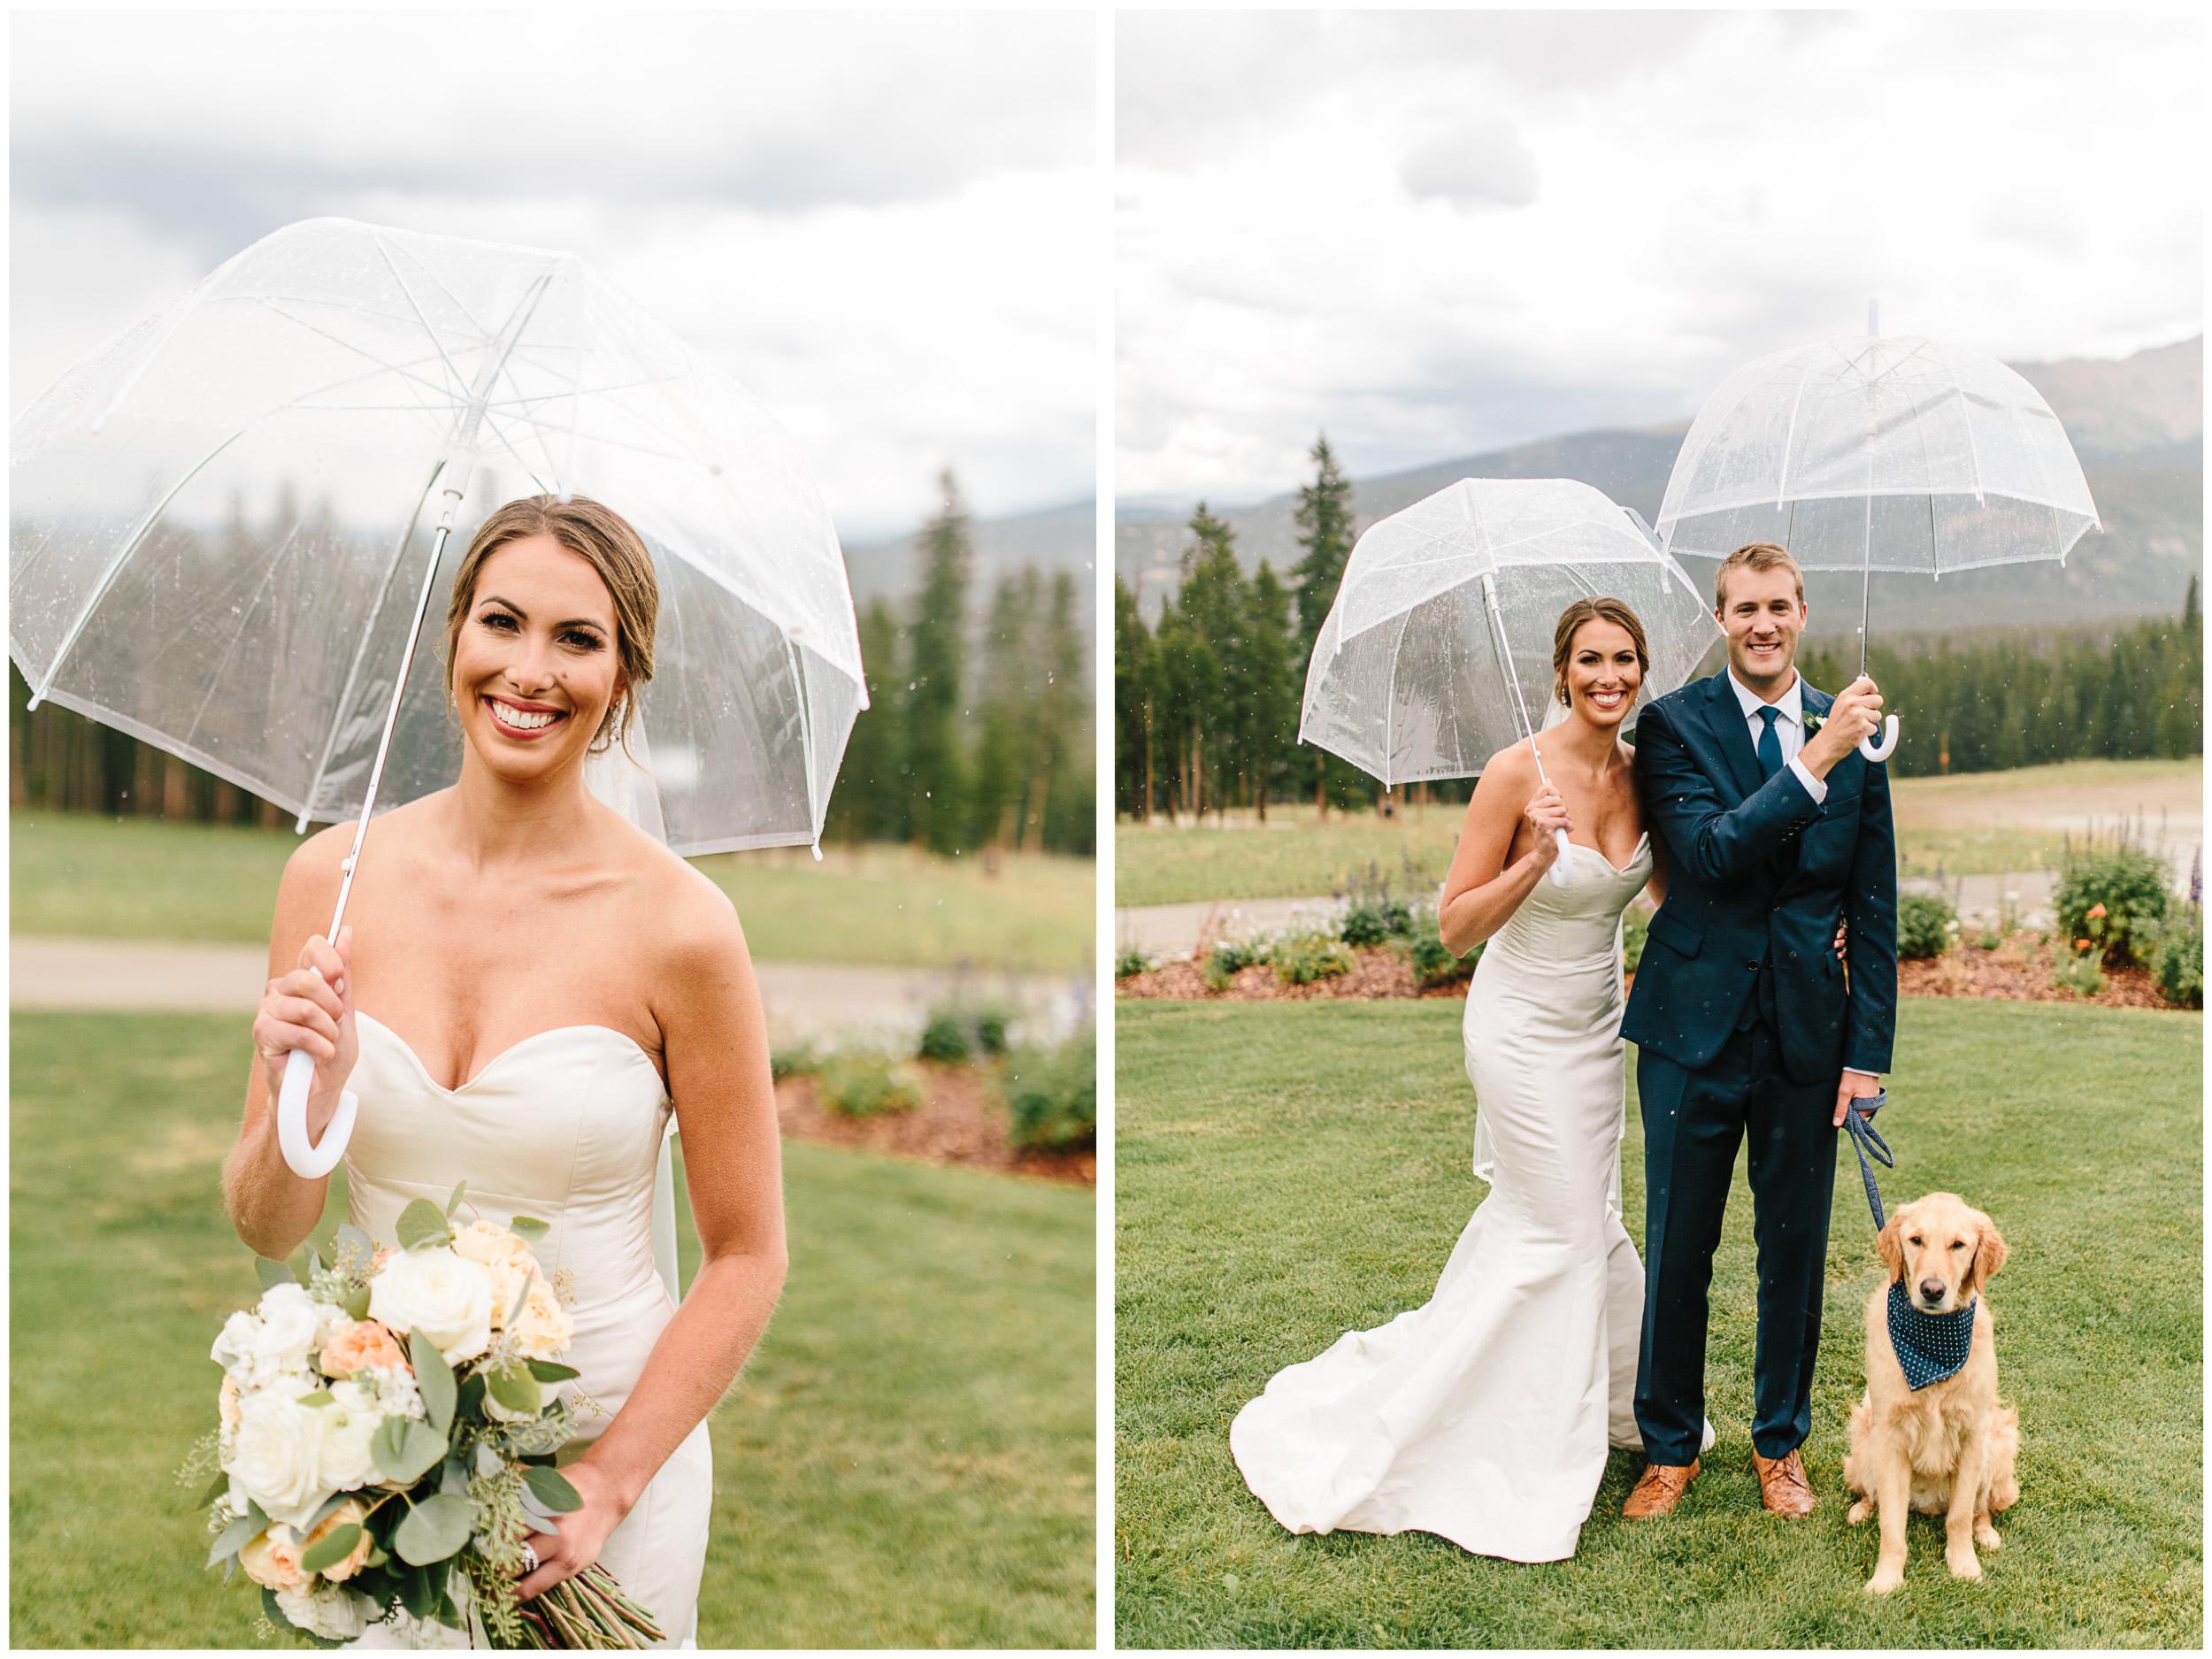 breckenridge_wedding_41.jpg